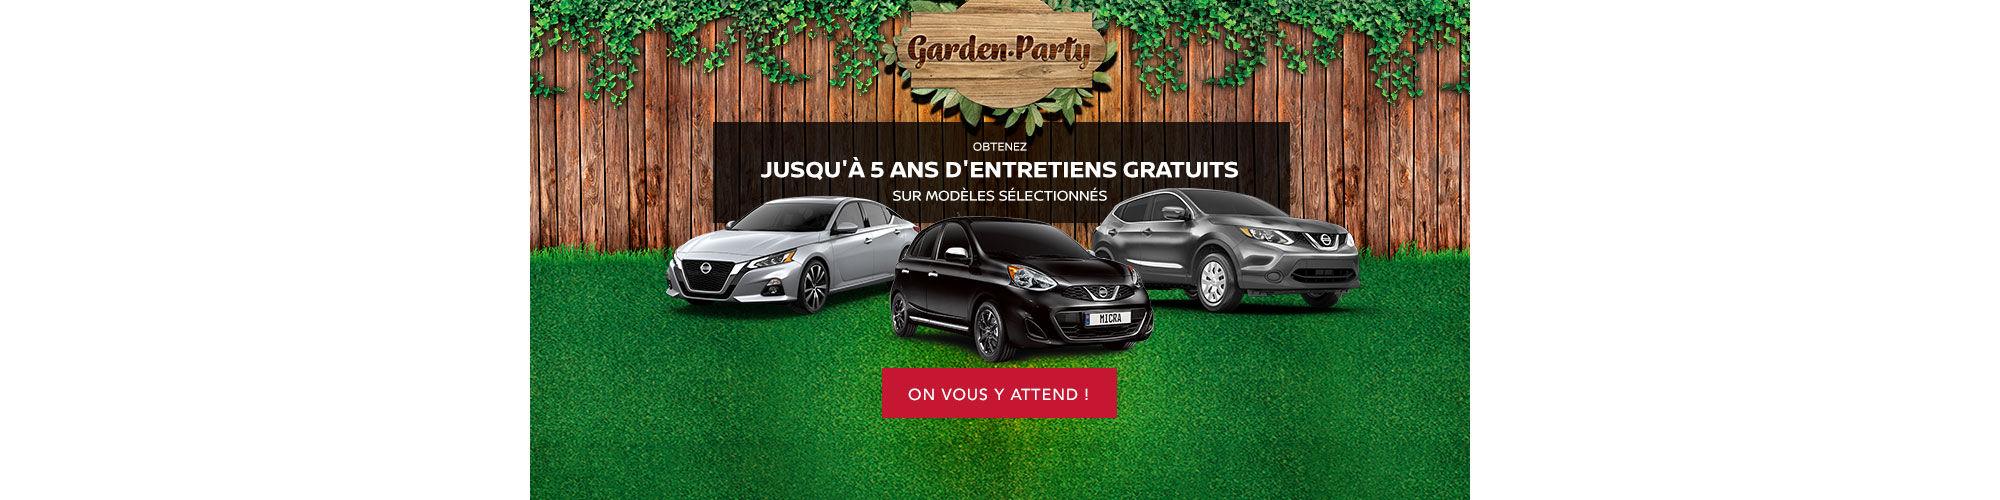 Nissan Garden Party